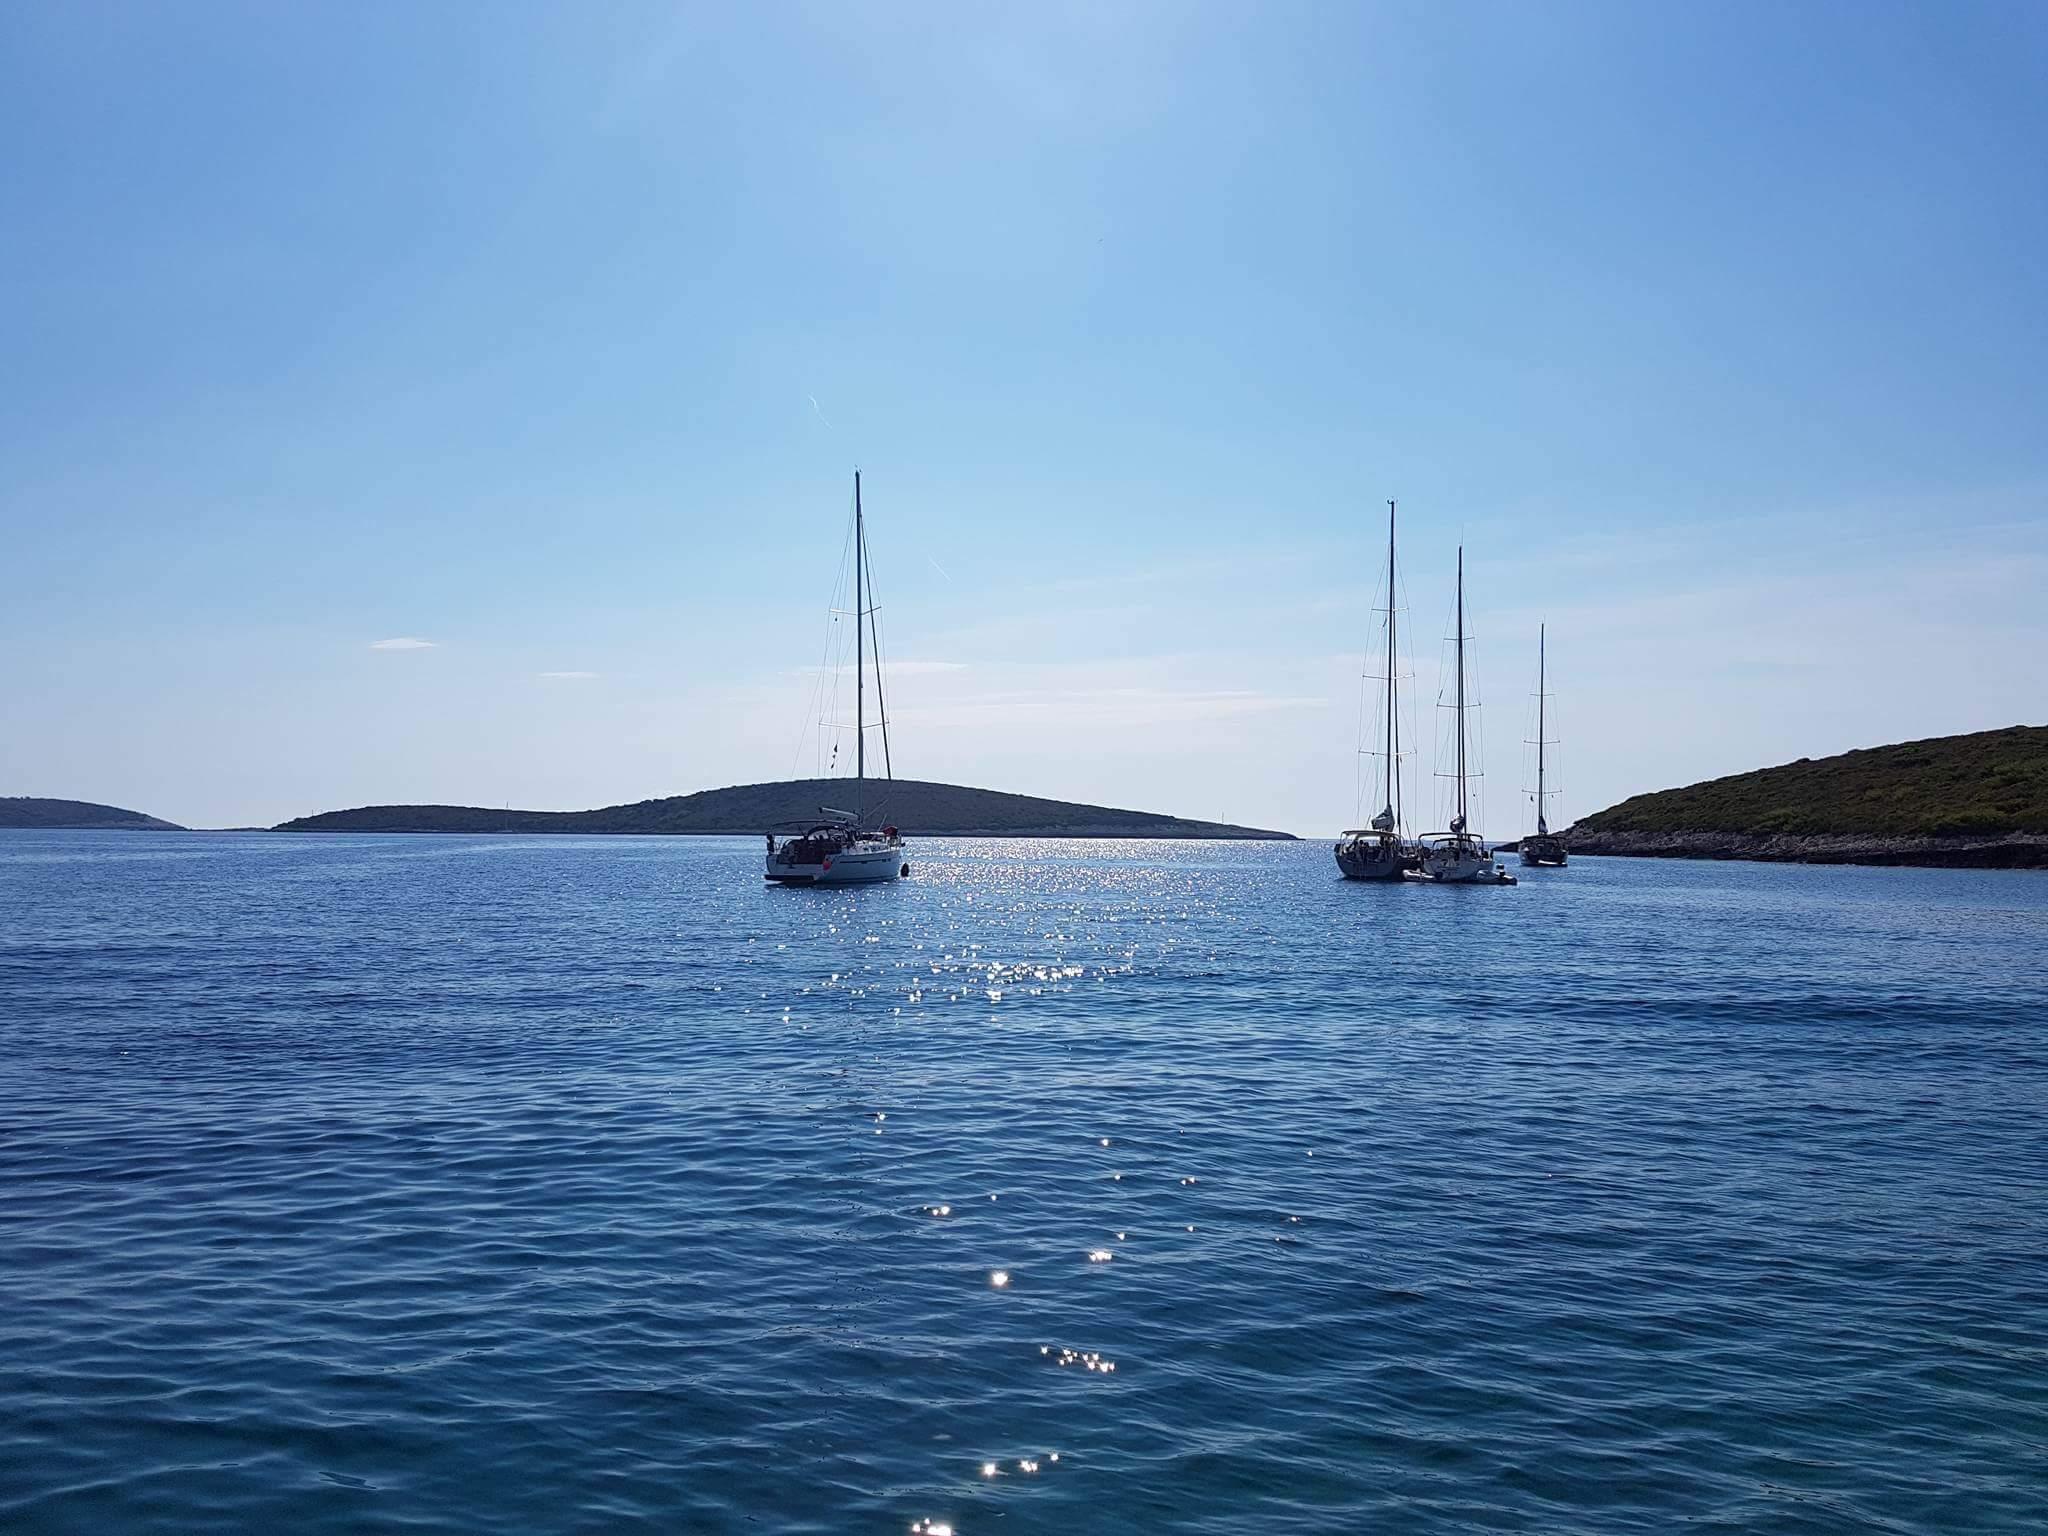 Seiltur i Kroatia sommeren 2016